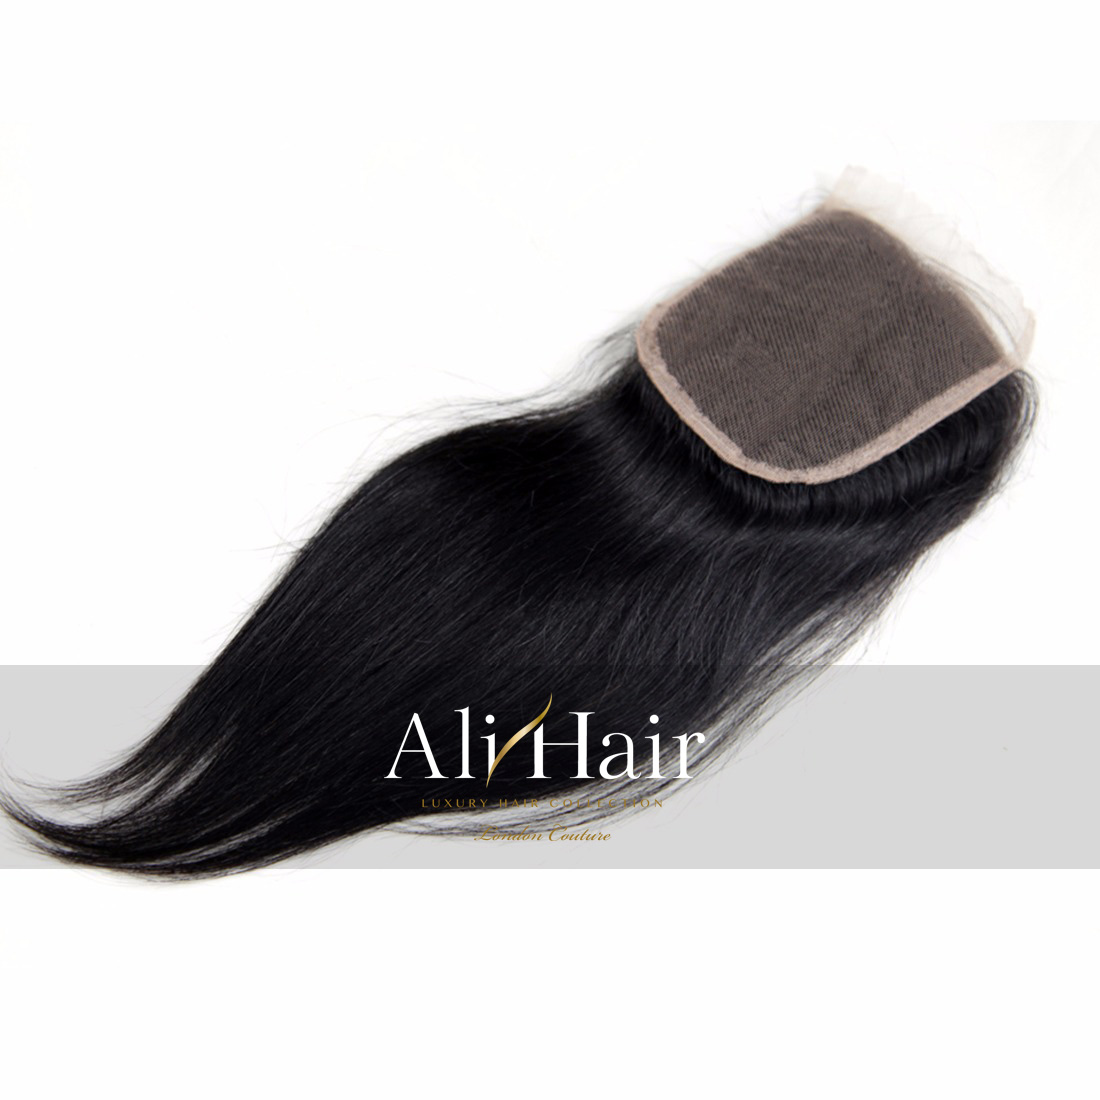 AliHair Brazilian 5x5 Straight Closure Human Gold Virgin Hair